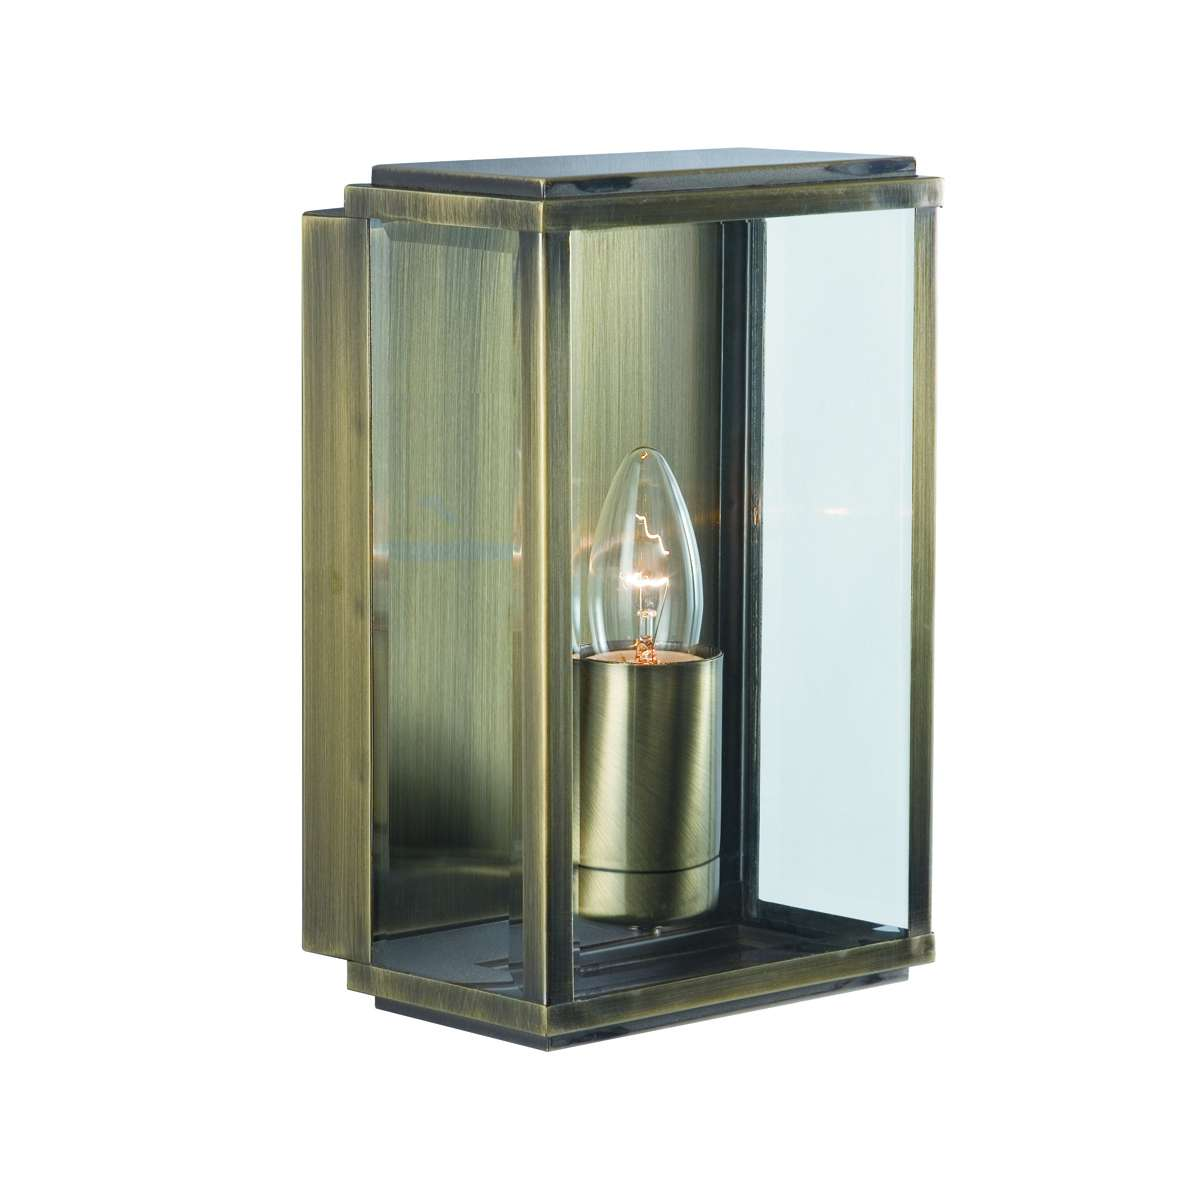 Antique Brass Ip44 Rectangular Outdoor Wall Lights(pack Of 6)*COPY*